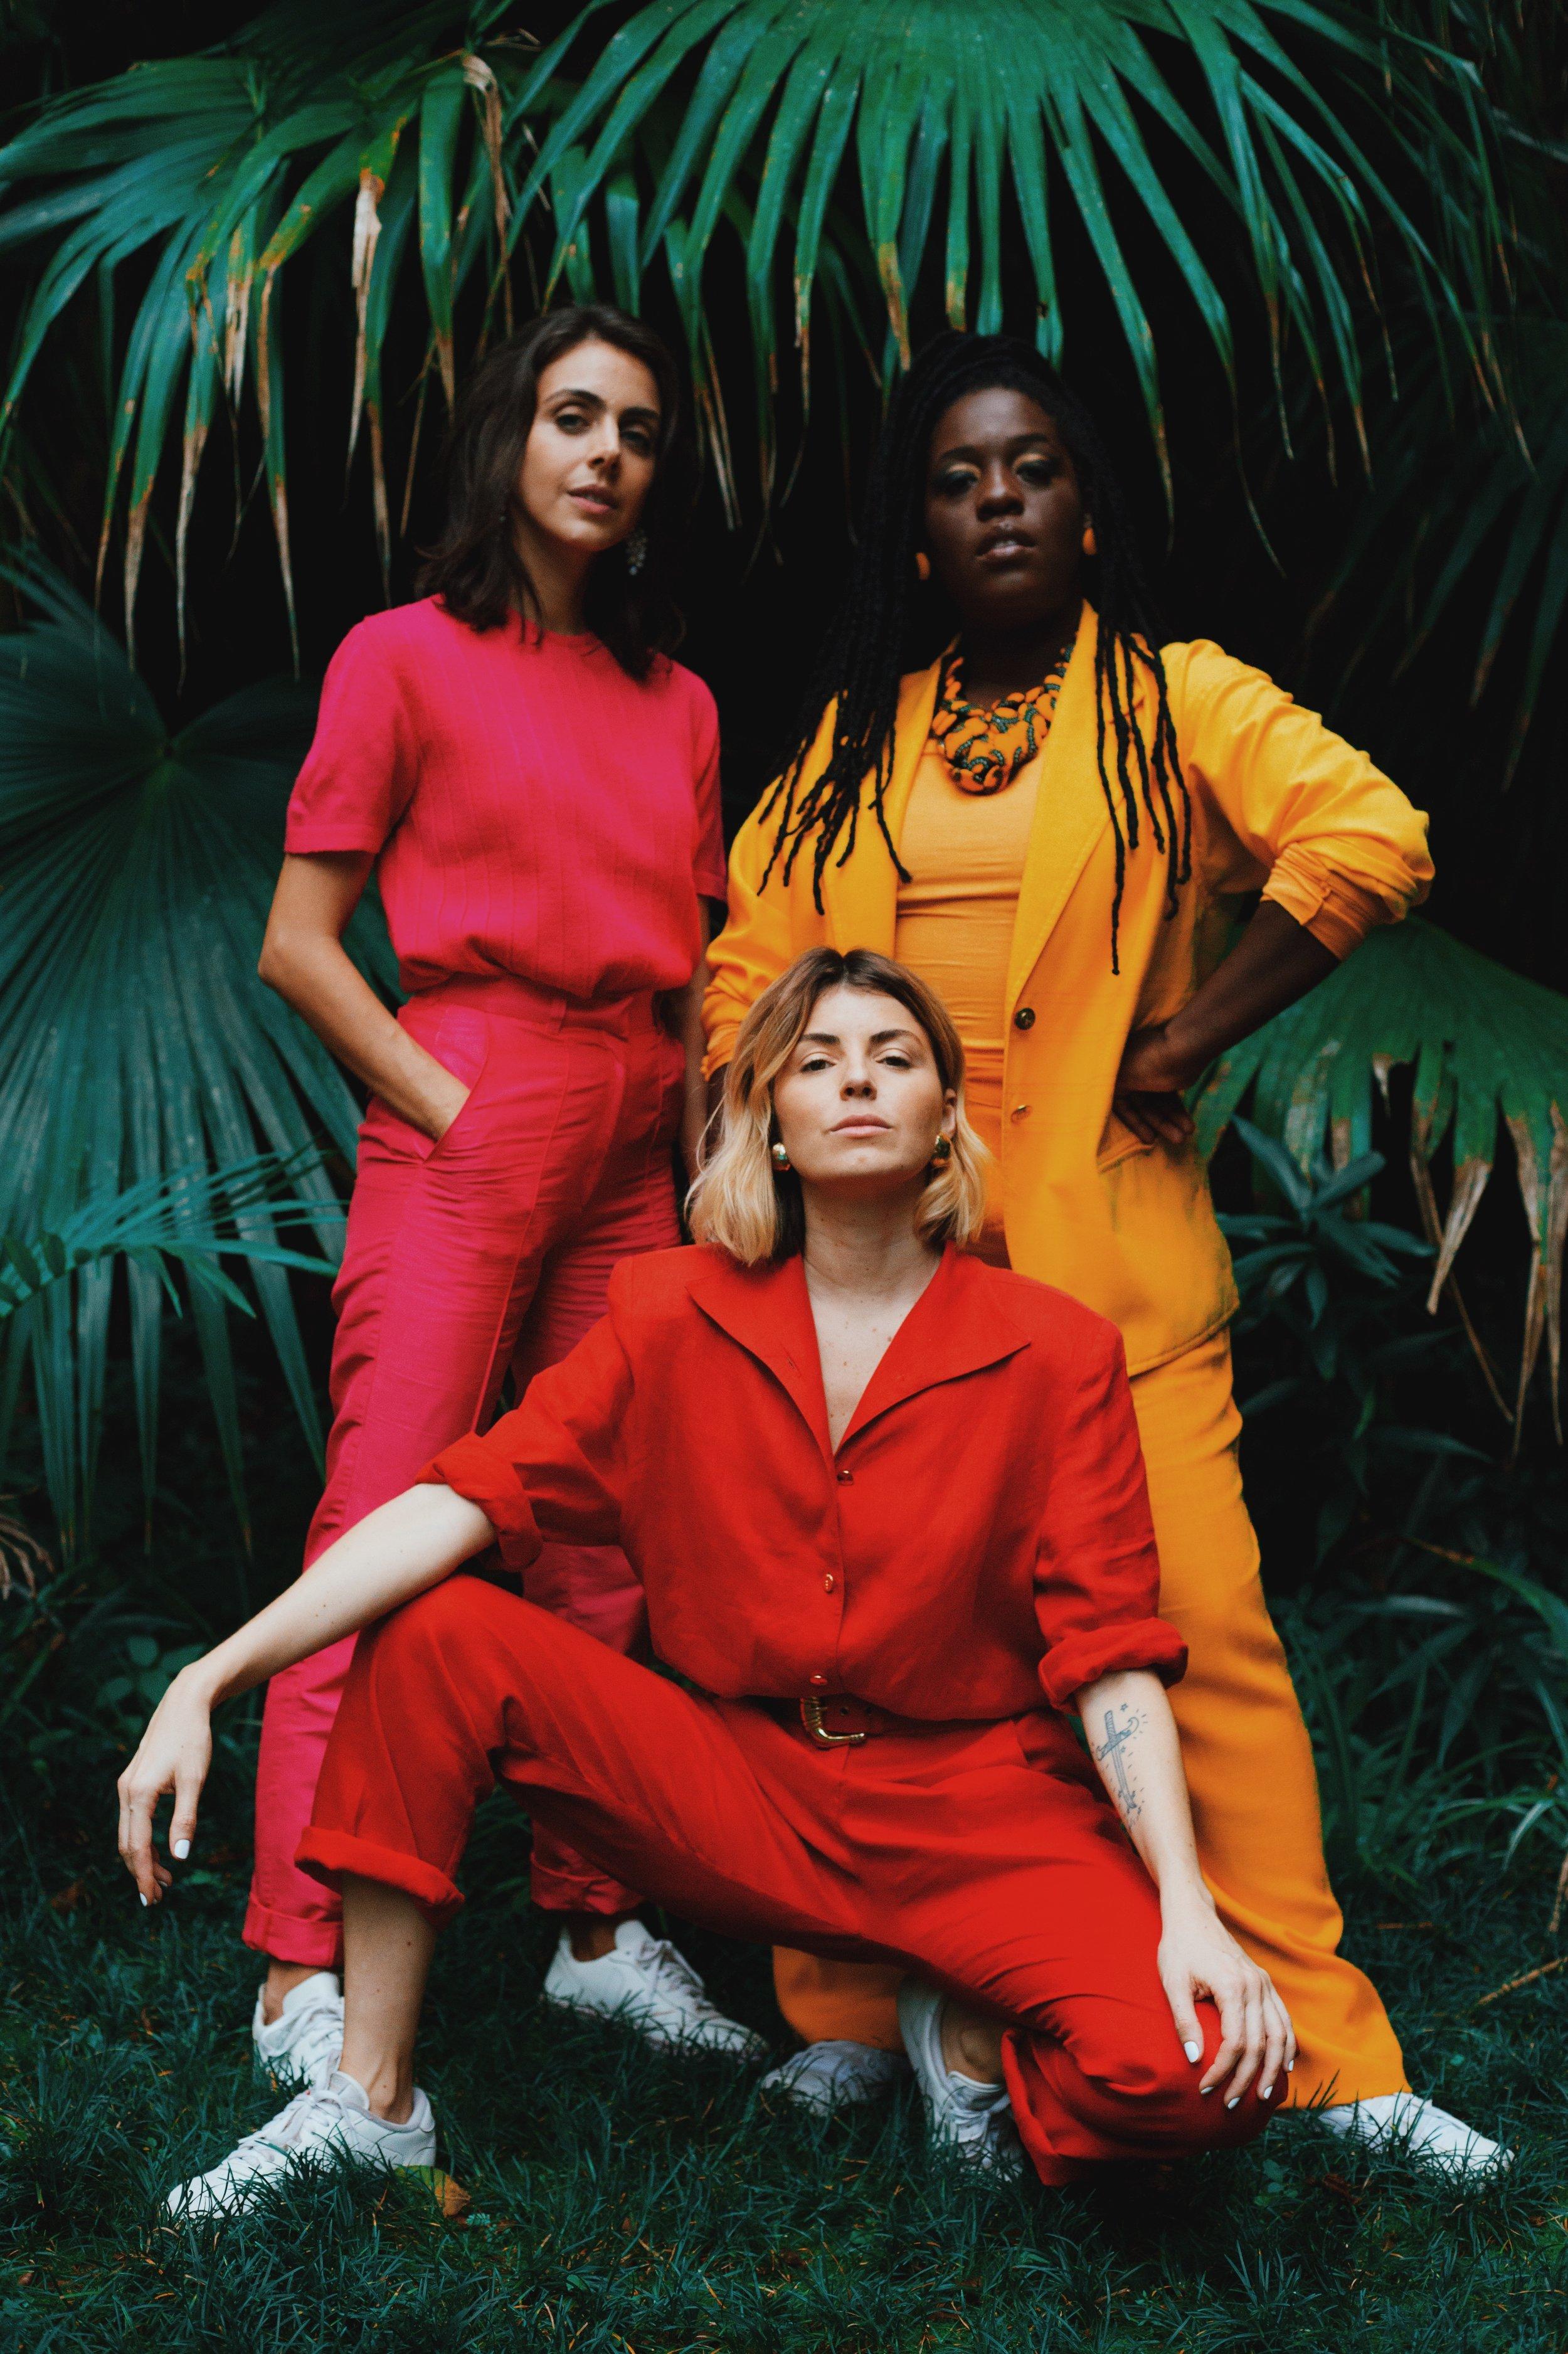 se essa roupa fosse minha  - estrelando Giovanna Nader, Ana Paula Xongani & Marininha Franco.